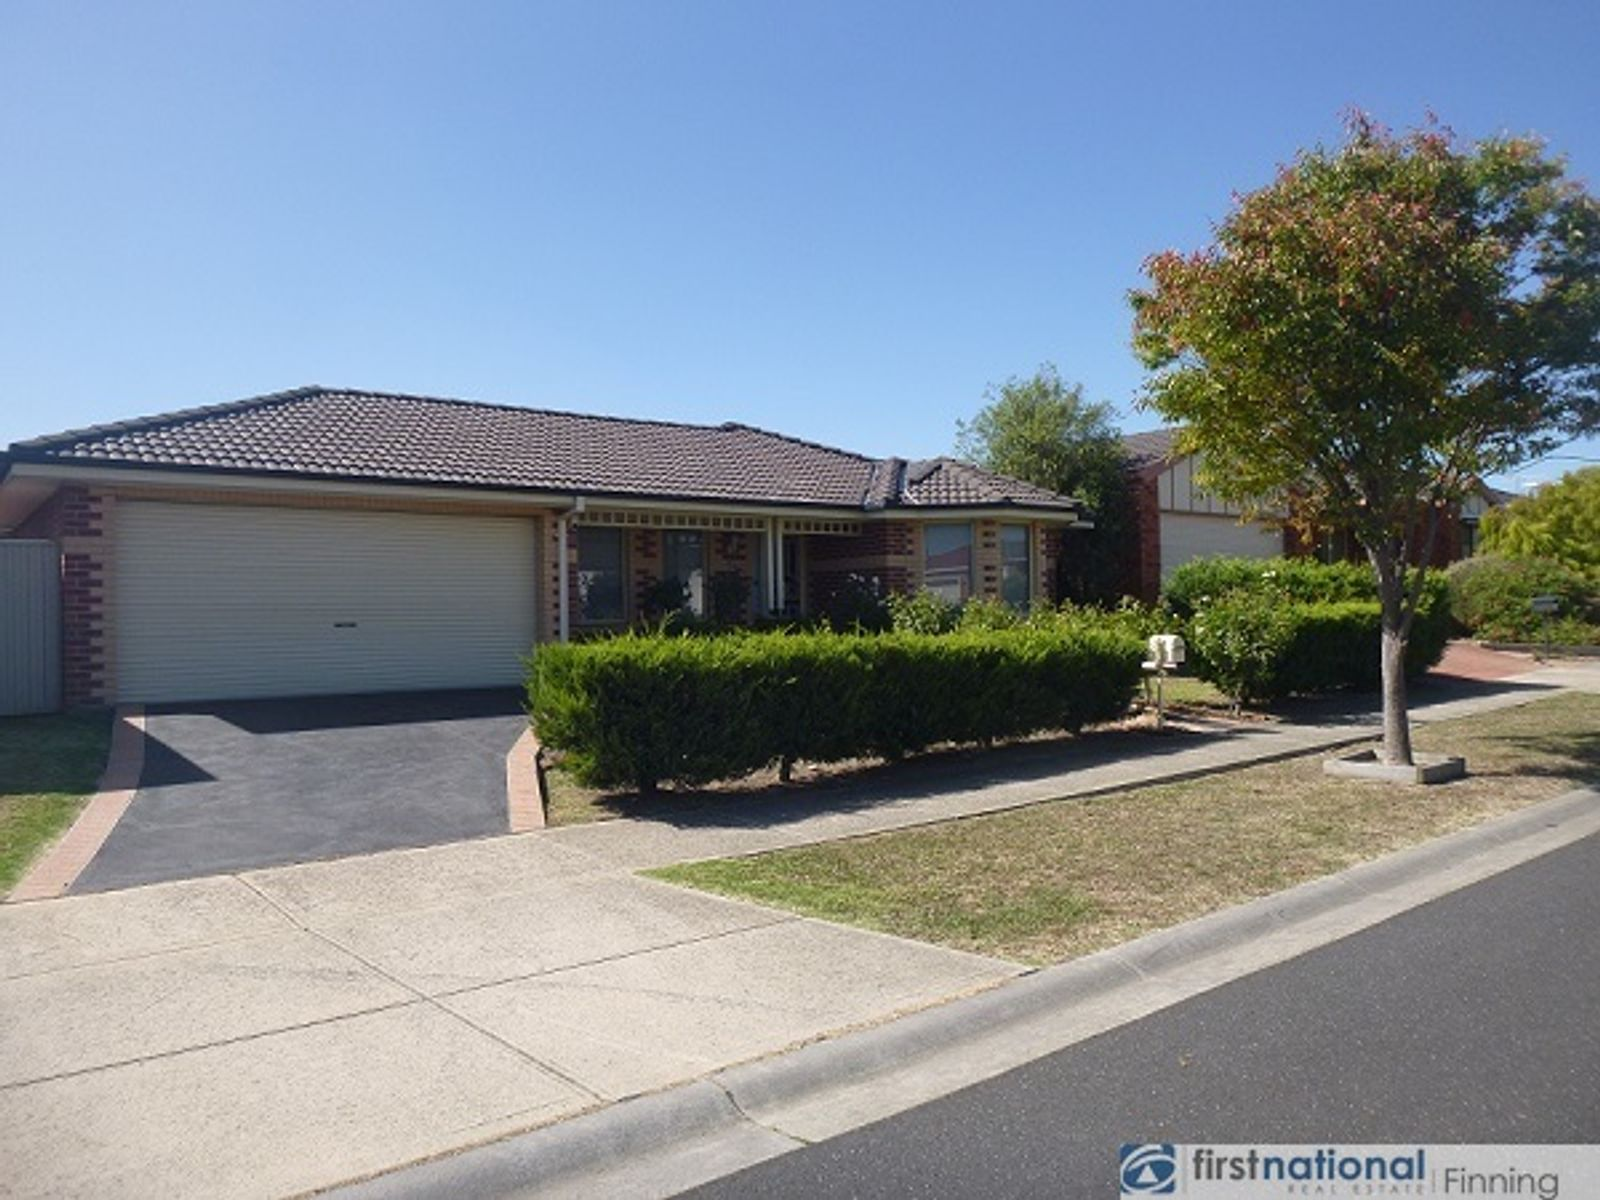 8 Gatehouse Drive, Cranbourne East, VIC 3977